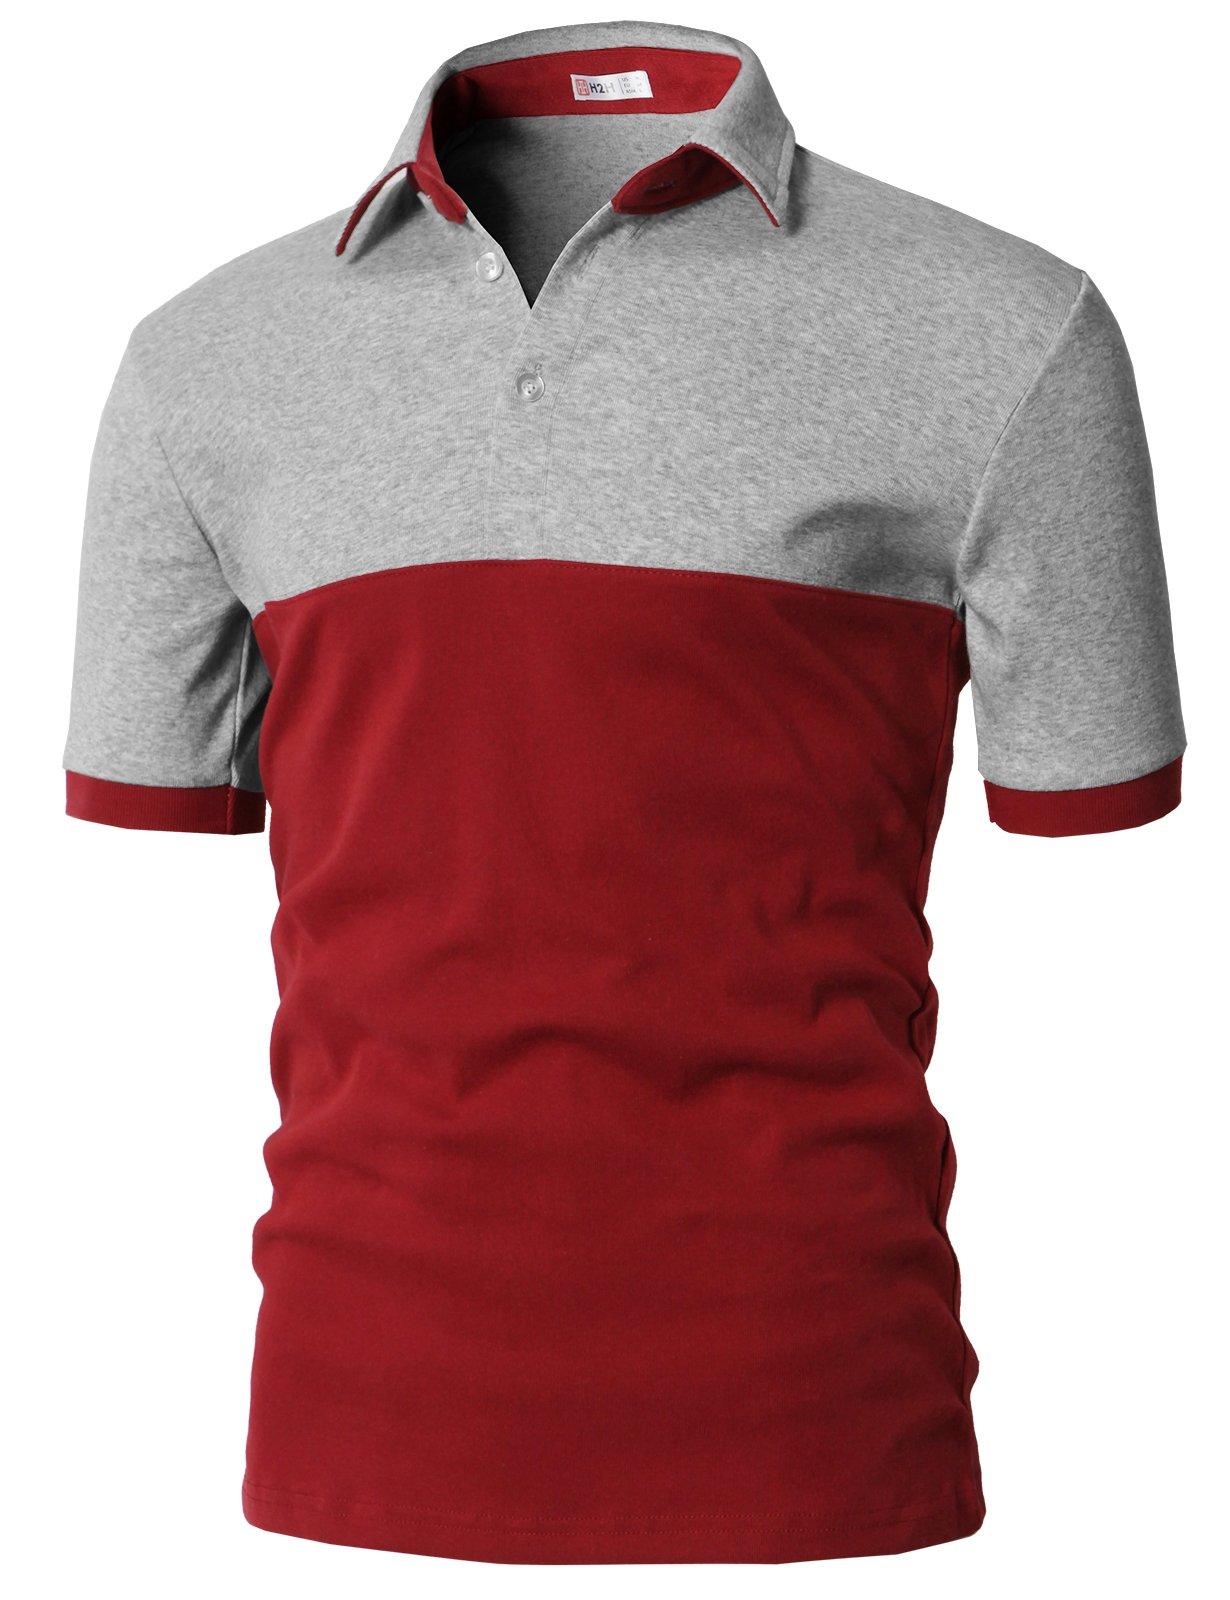 H2H Mens Fine Cotton Polo T-Shirts Gray US XL/Asia 2XL (KMTTS0554)